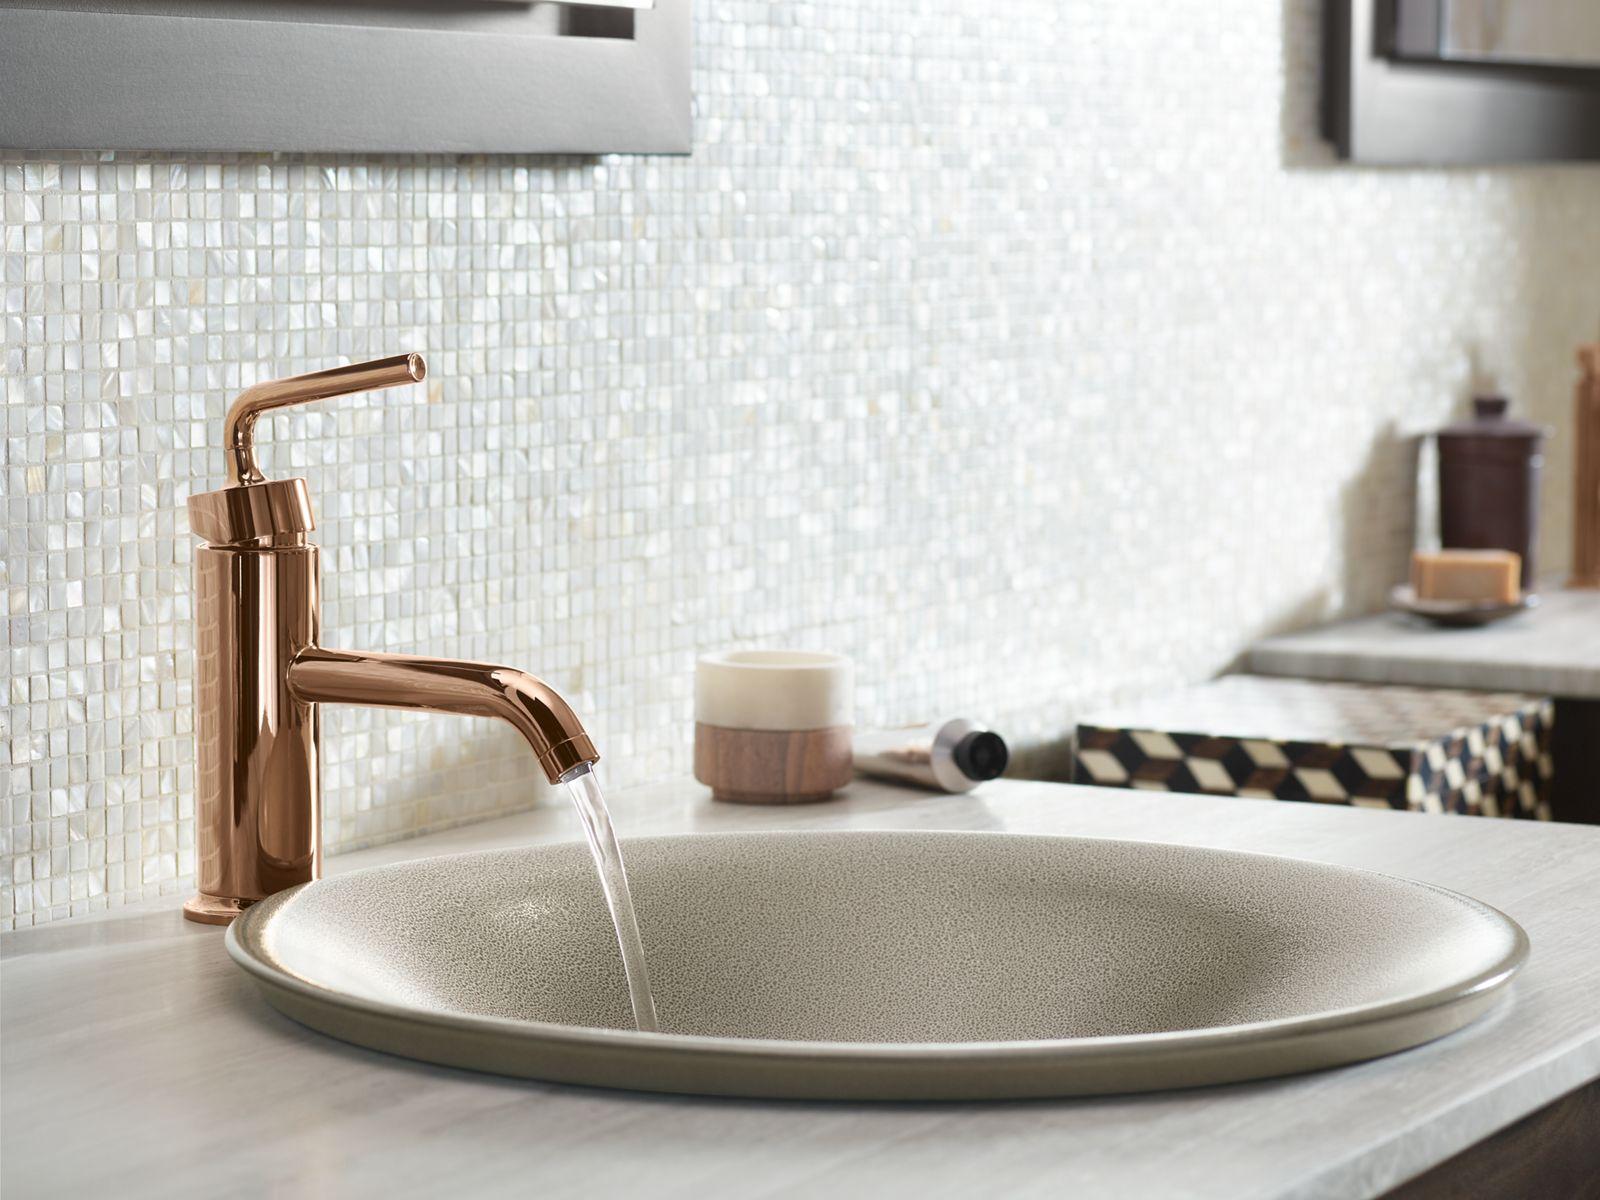 vibrant rose gold bathroom faucet